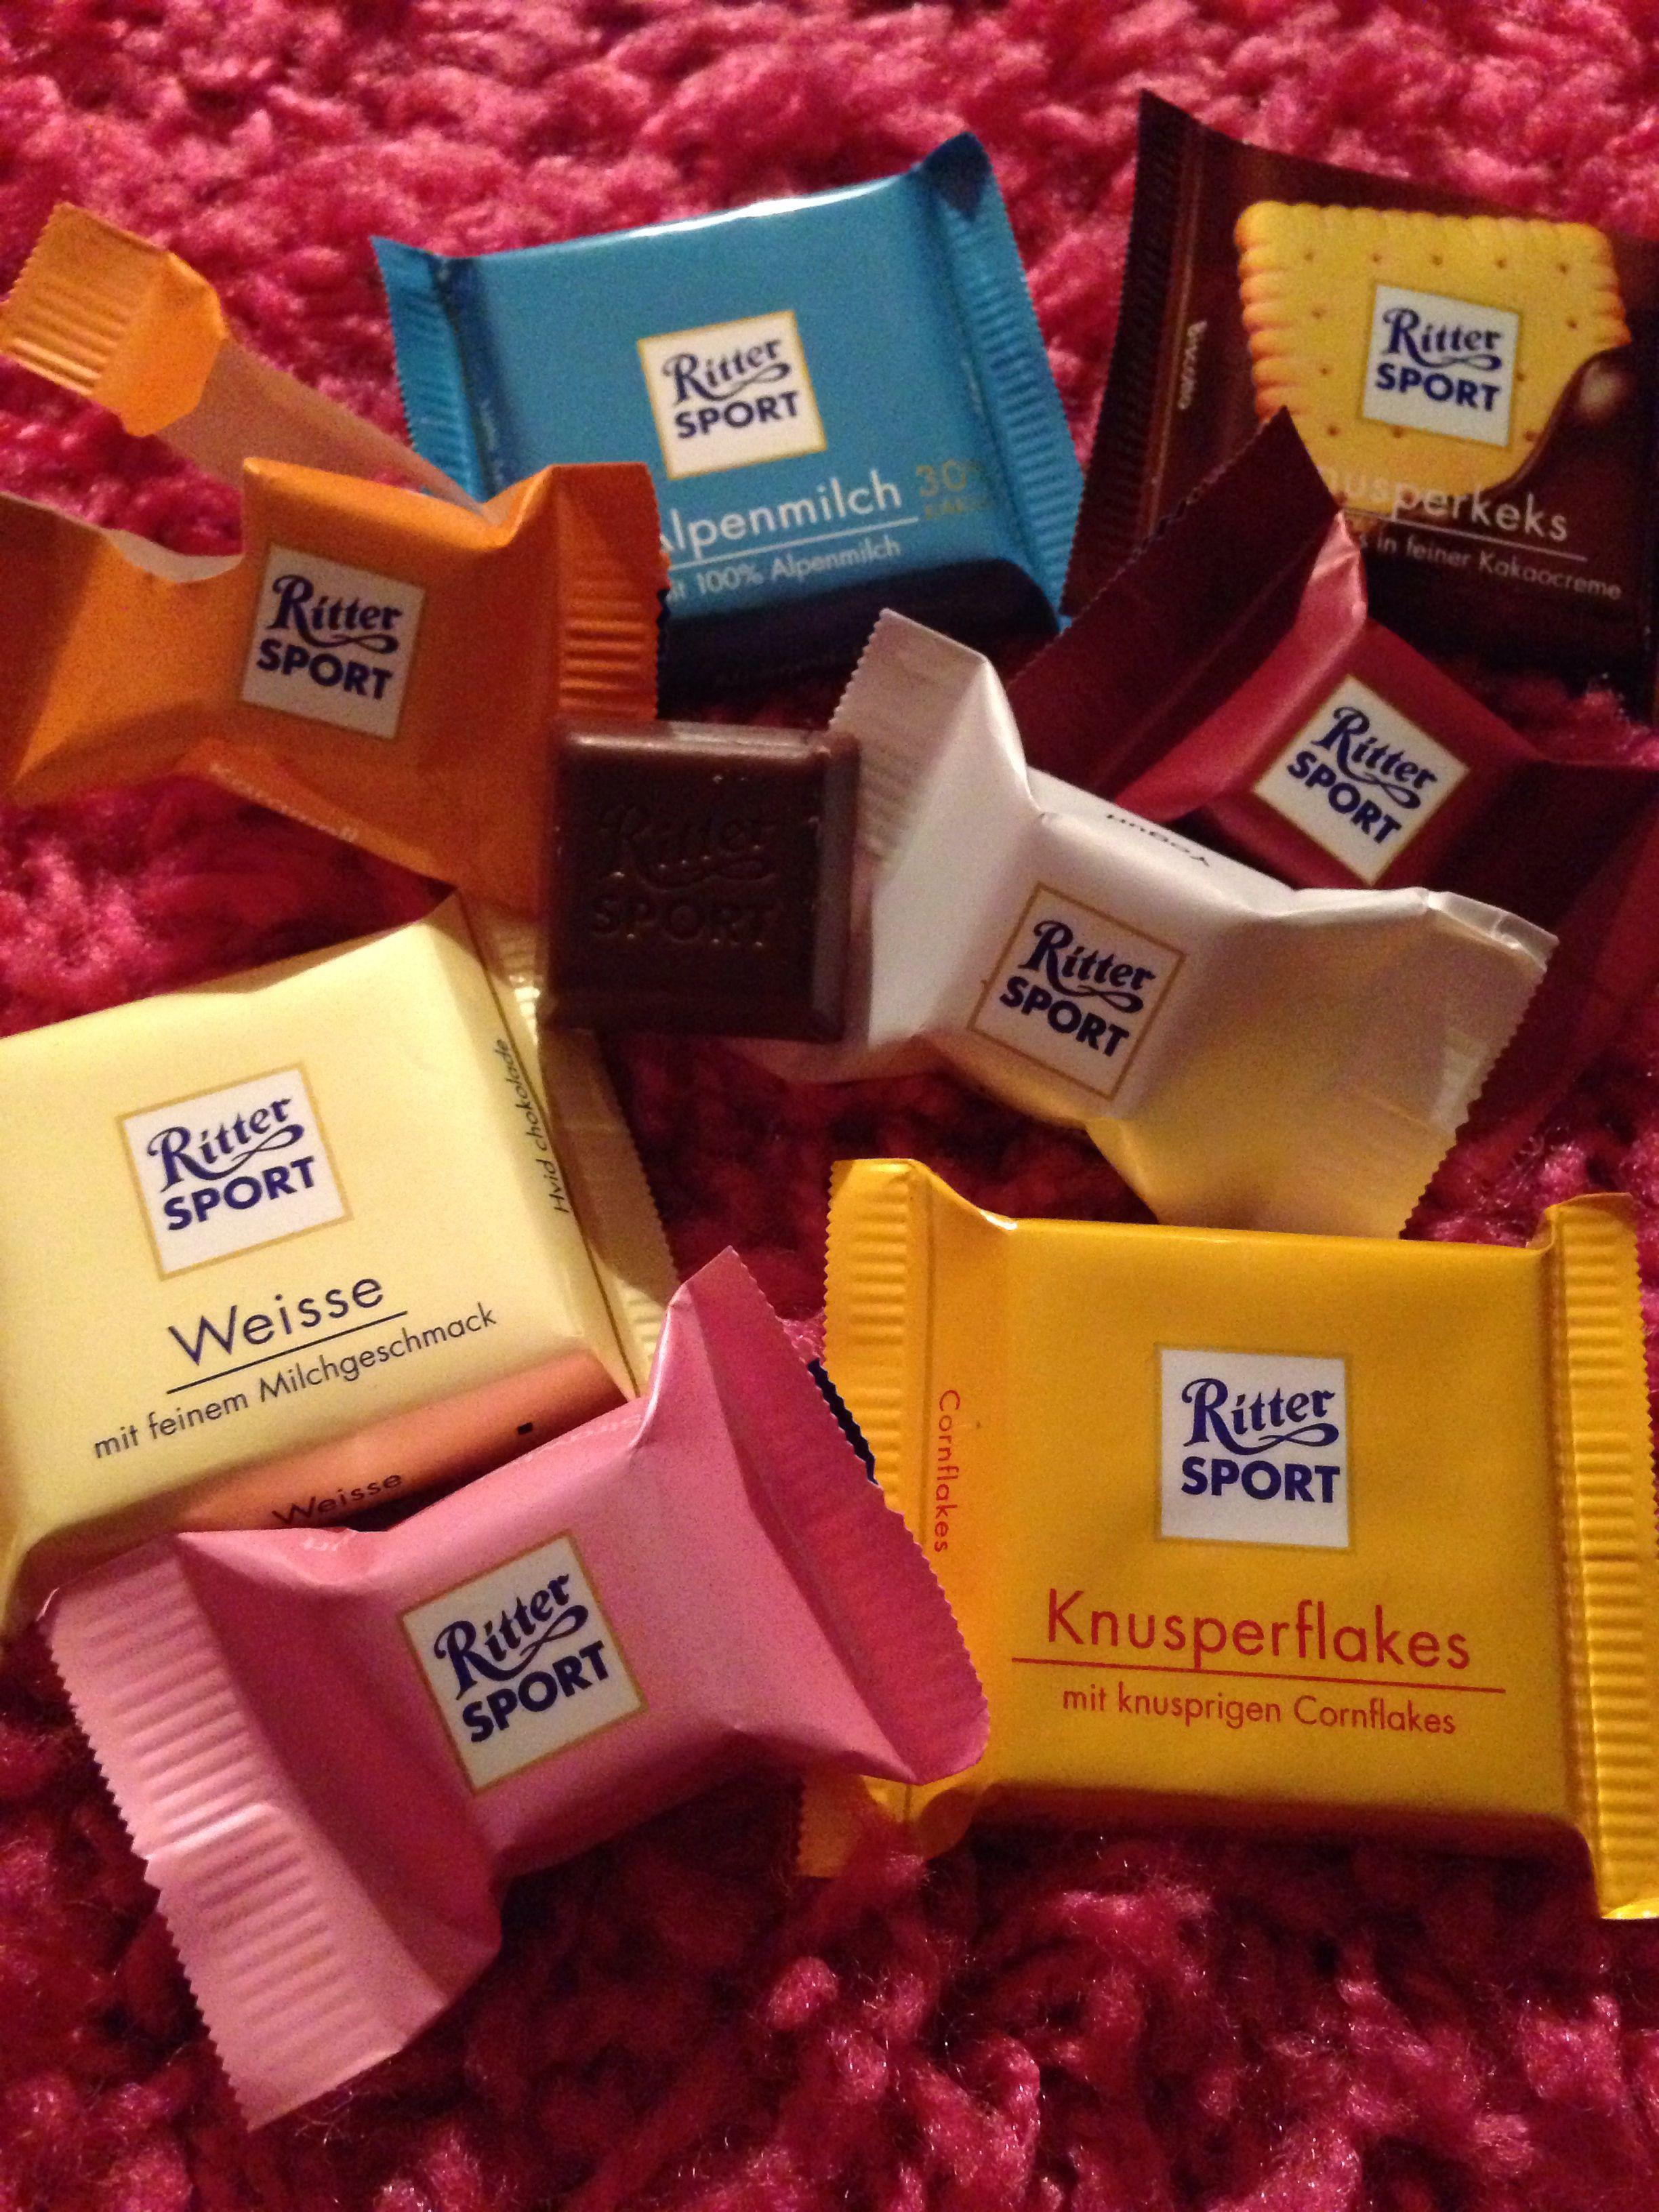 Riter sport Chocolate nuts, Food, Eat